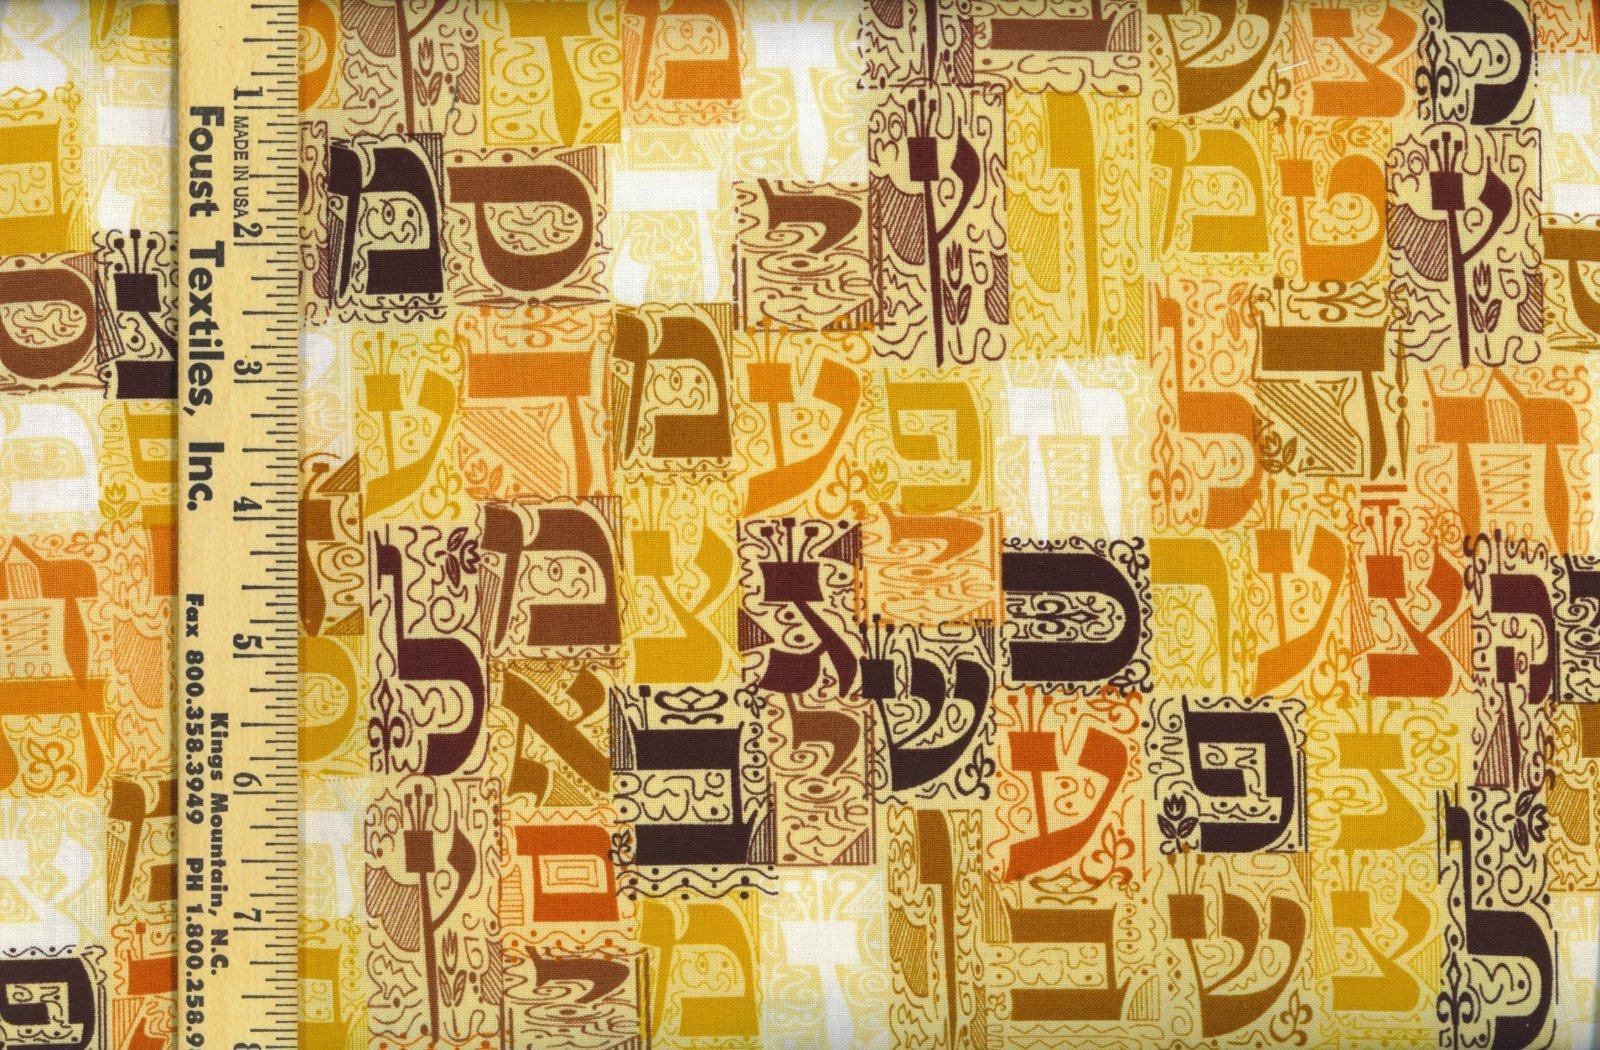 JD-Aleph Bet 1806 Beige